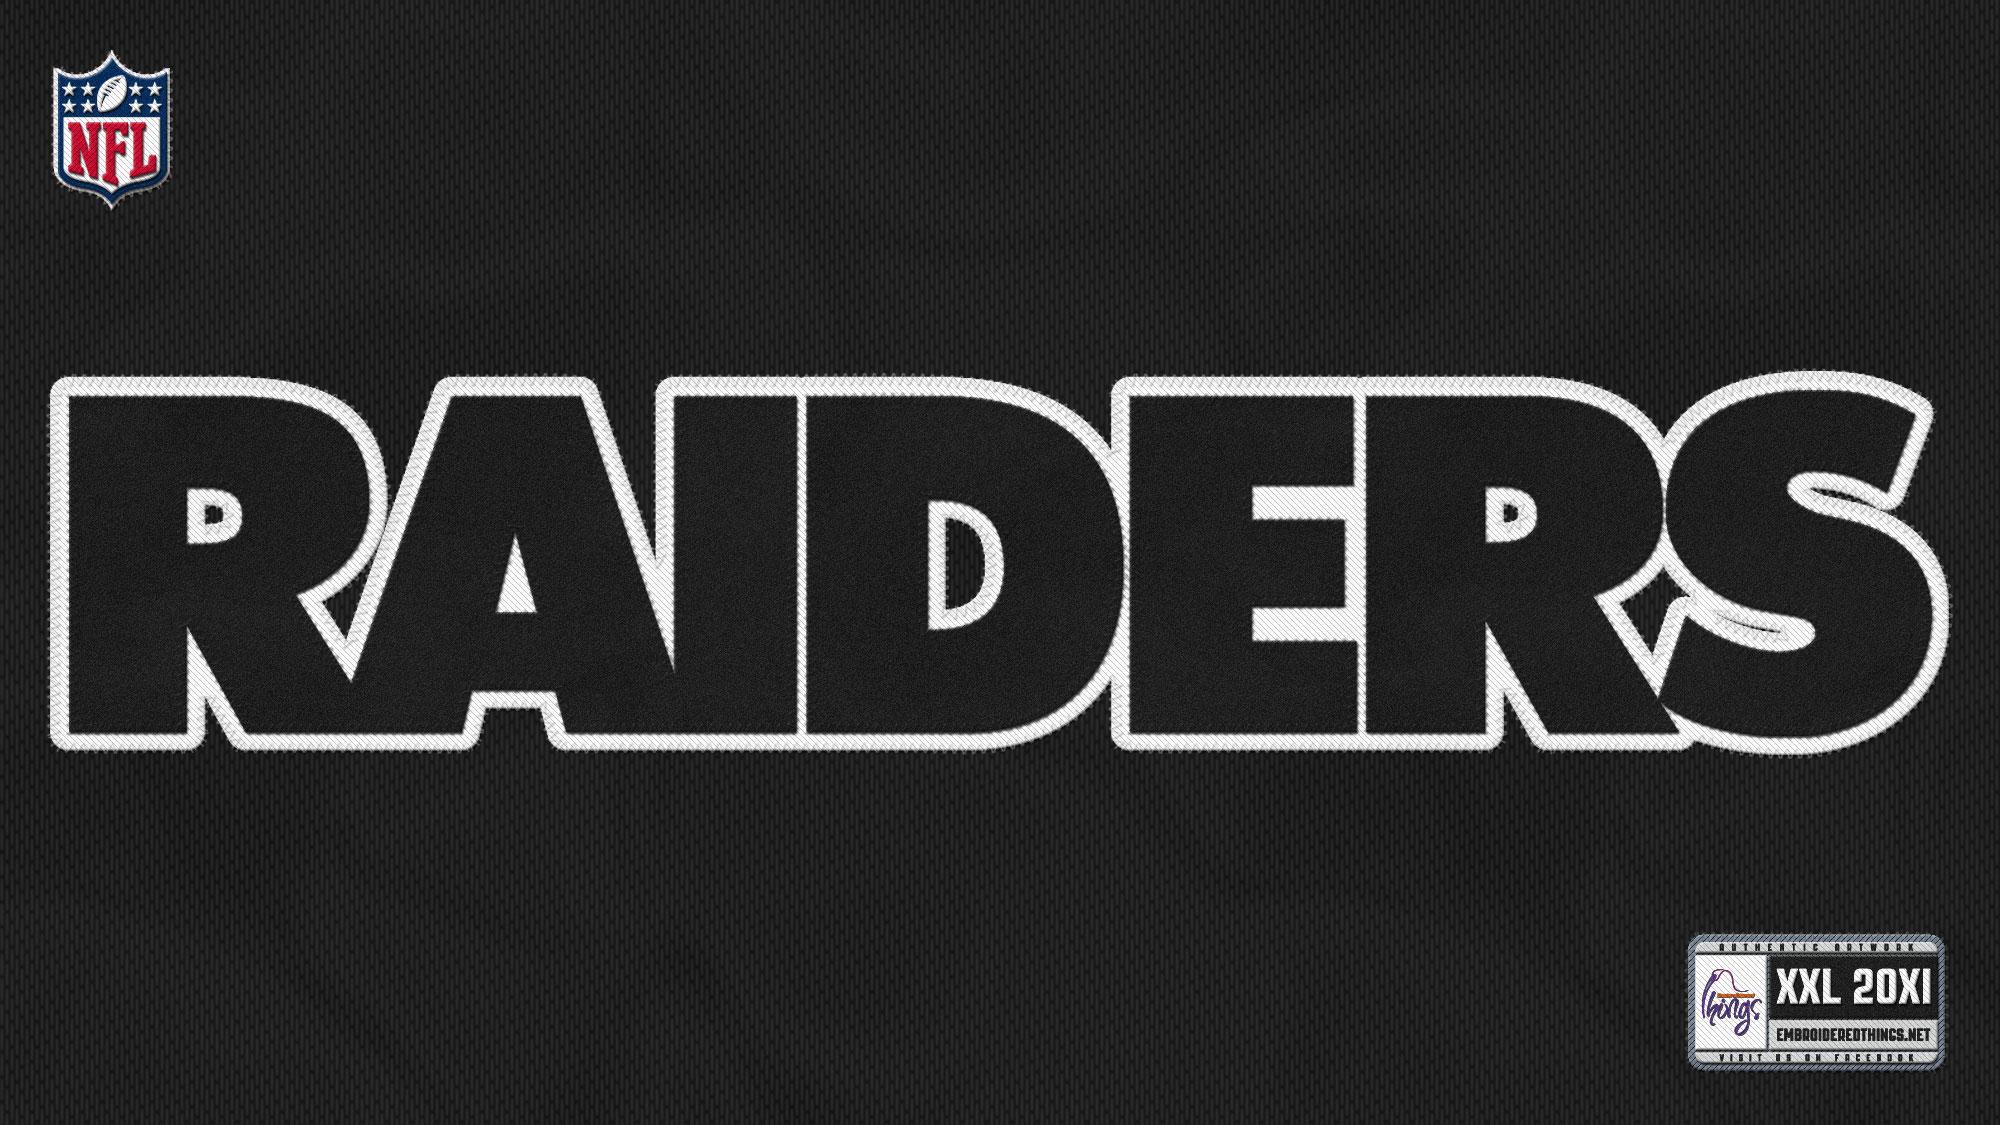 202 best images about <b>Oakland Raiders</b> on Pinterest | <b>Oakland</b> ...